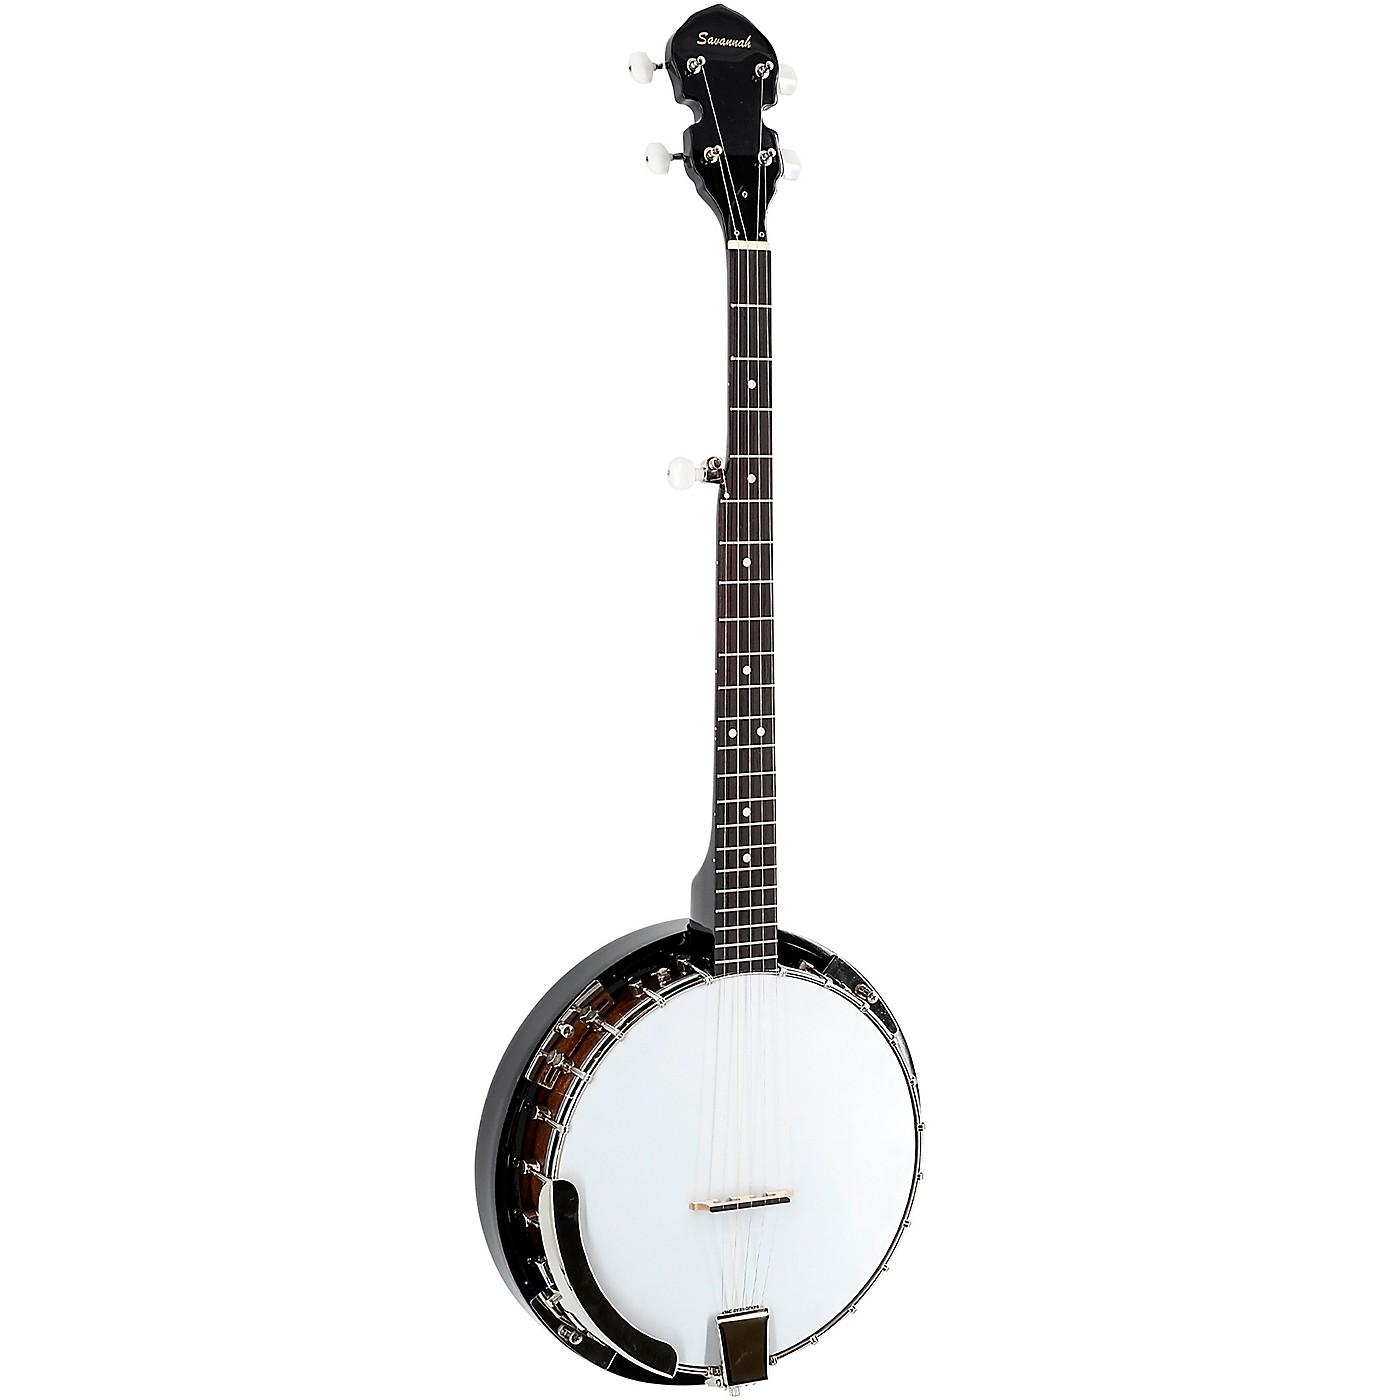 Savannah SB-095 Resonator 5-String Banjo thumbnail